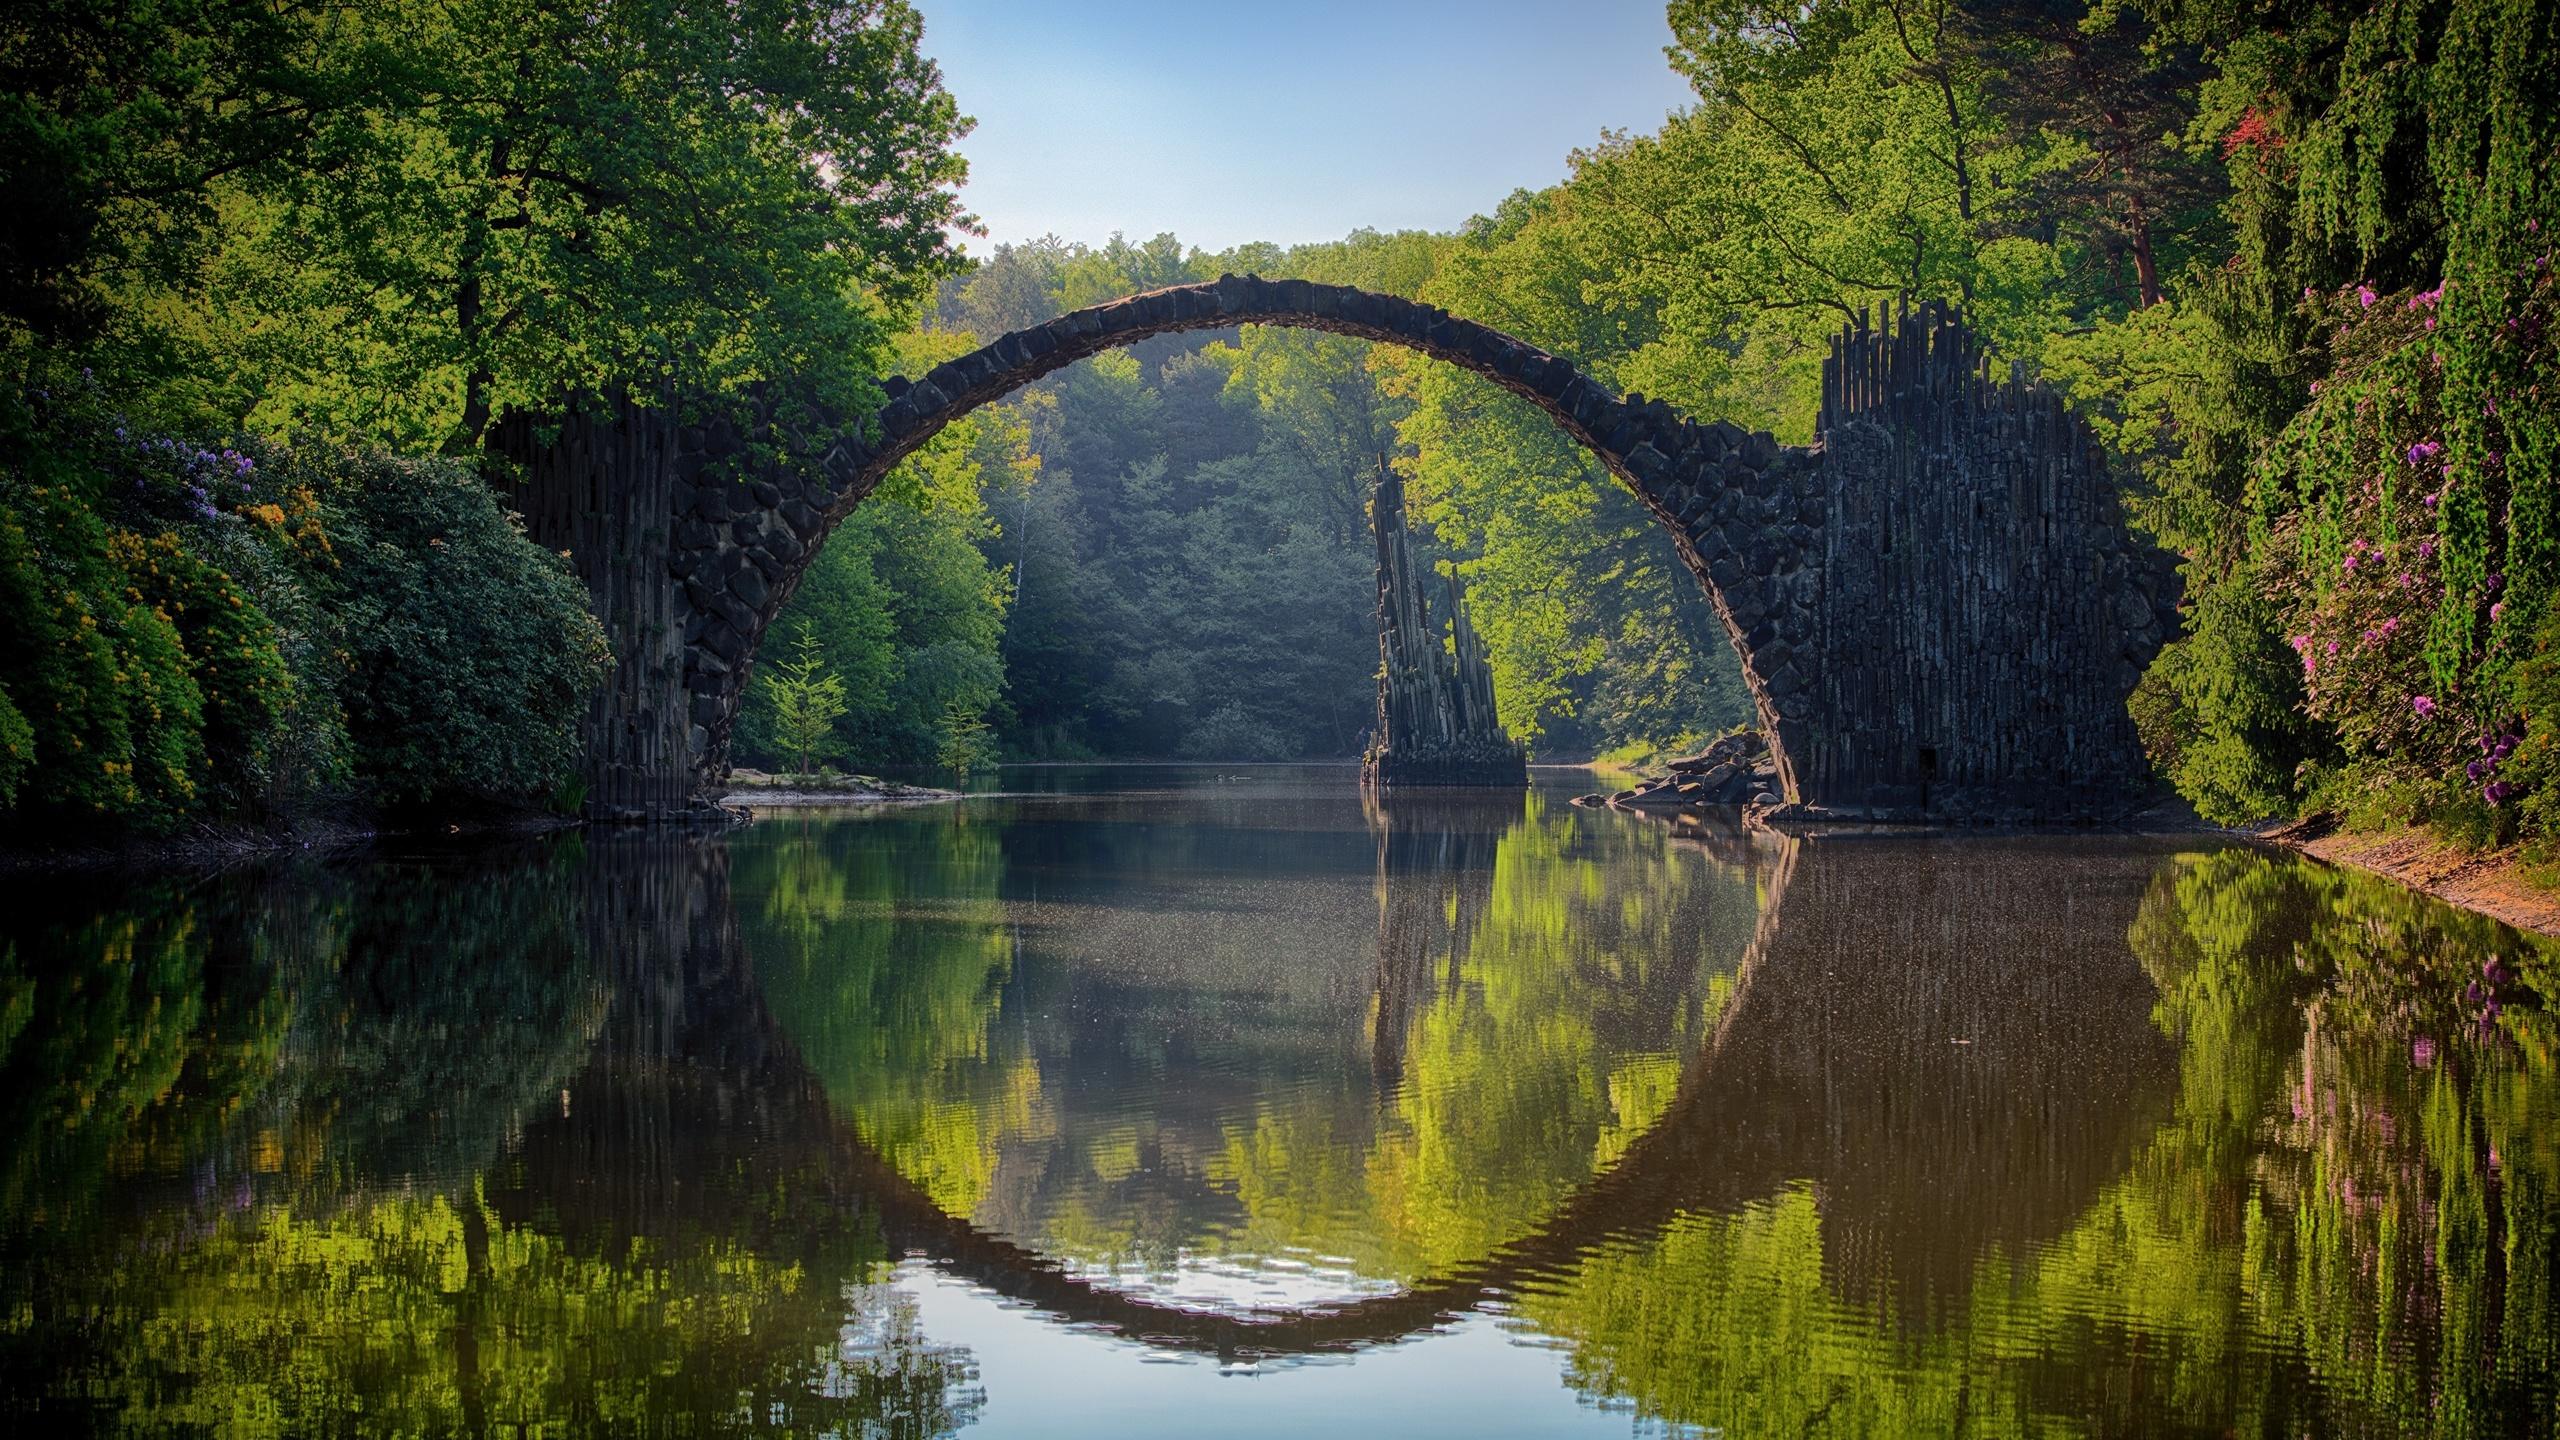 германия, парк, bridge rocketspace, park kromelow, природа